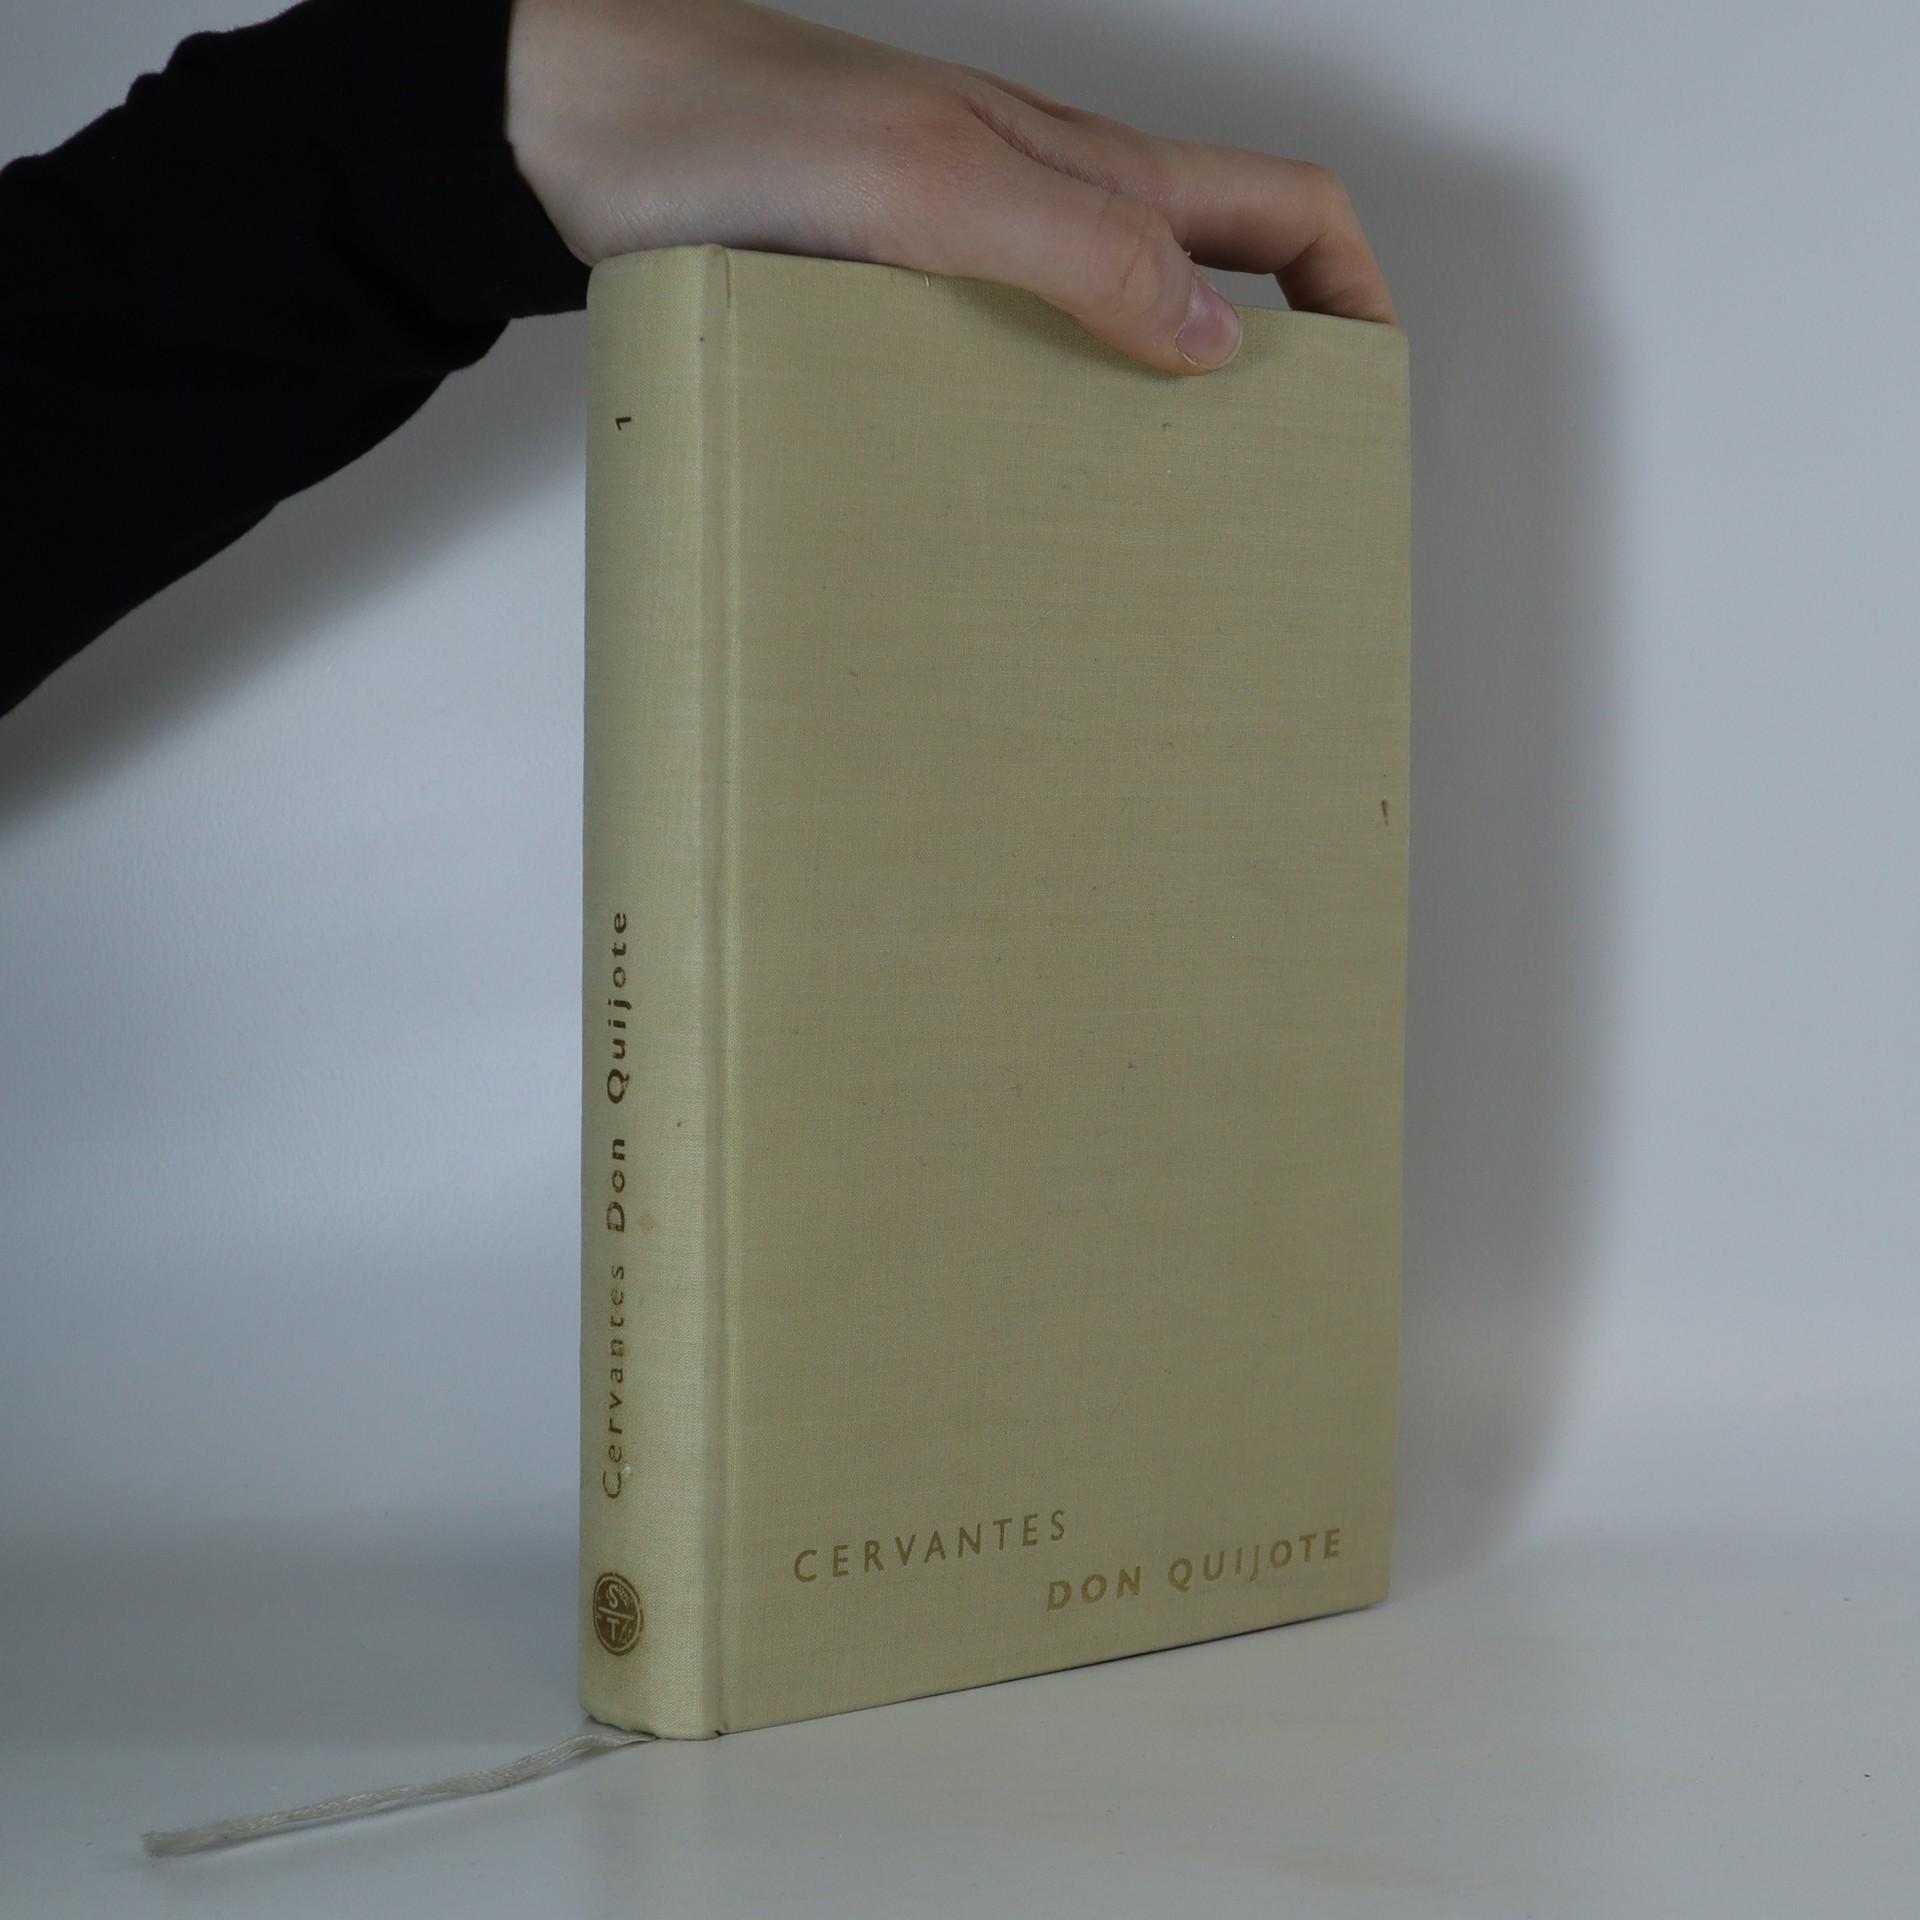 antikvární kniha Dômyselný rytier Don Quijote de la Mancha, 1965